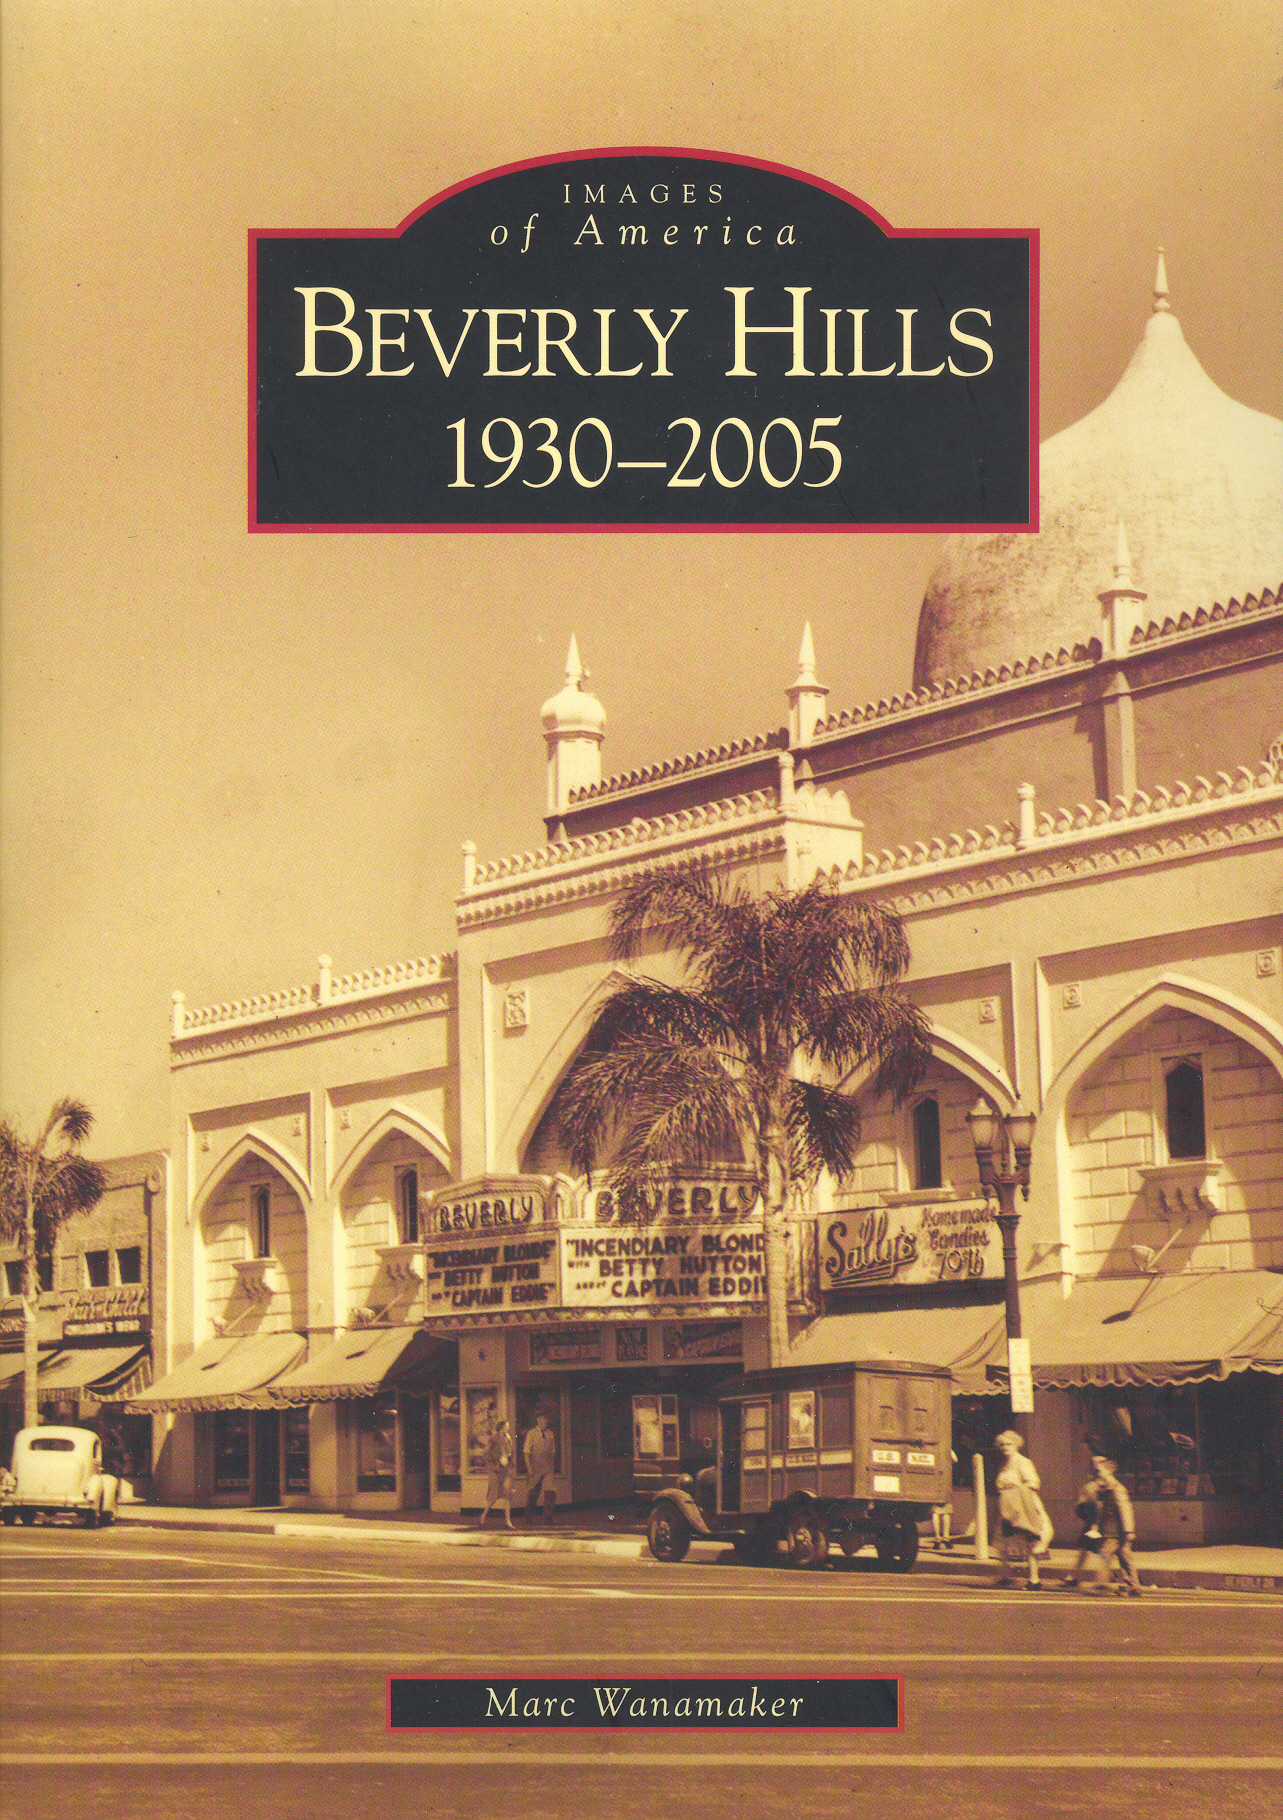 Book_Wanamaker_BH 1930-2005.jpg